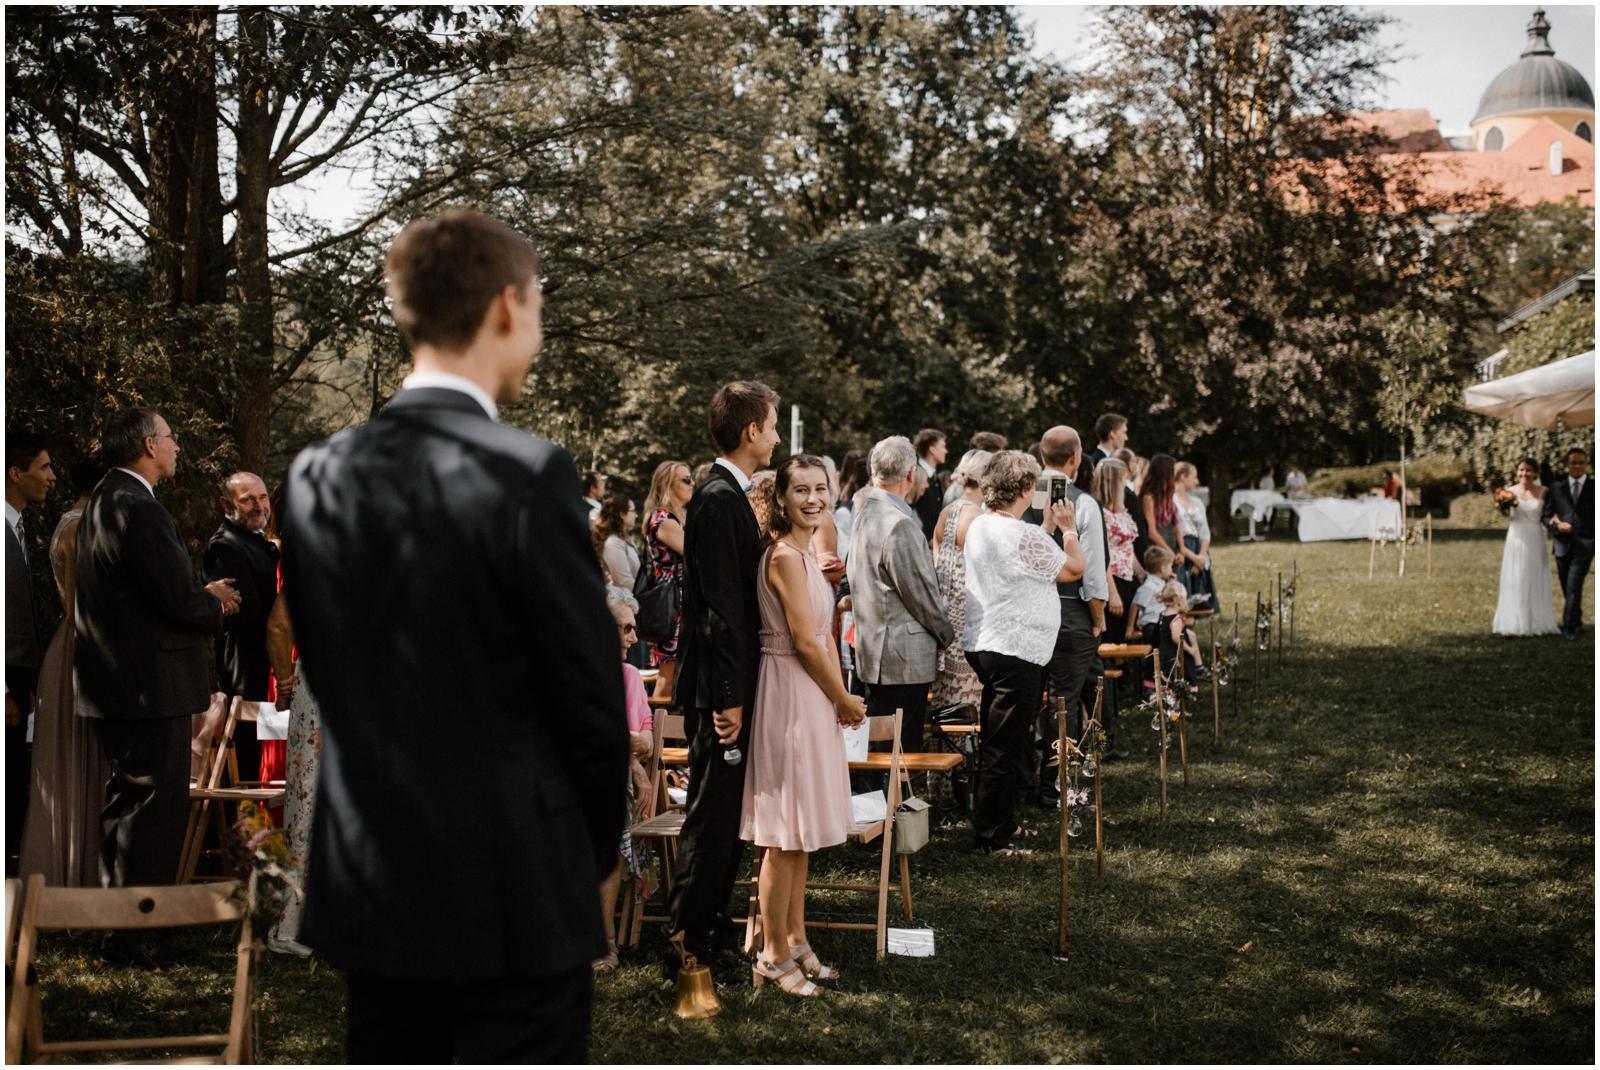 mirjam_thomas_wedding-316.jpg